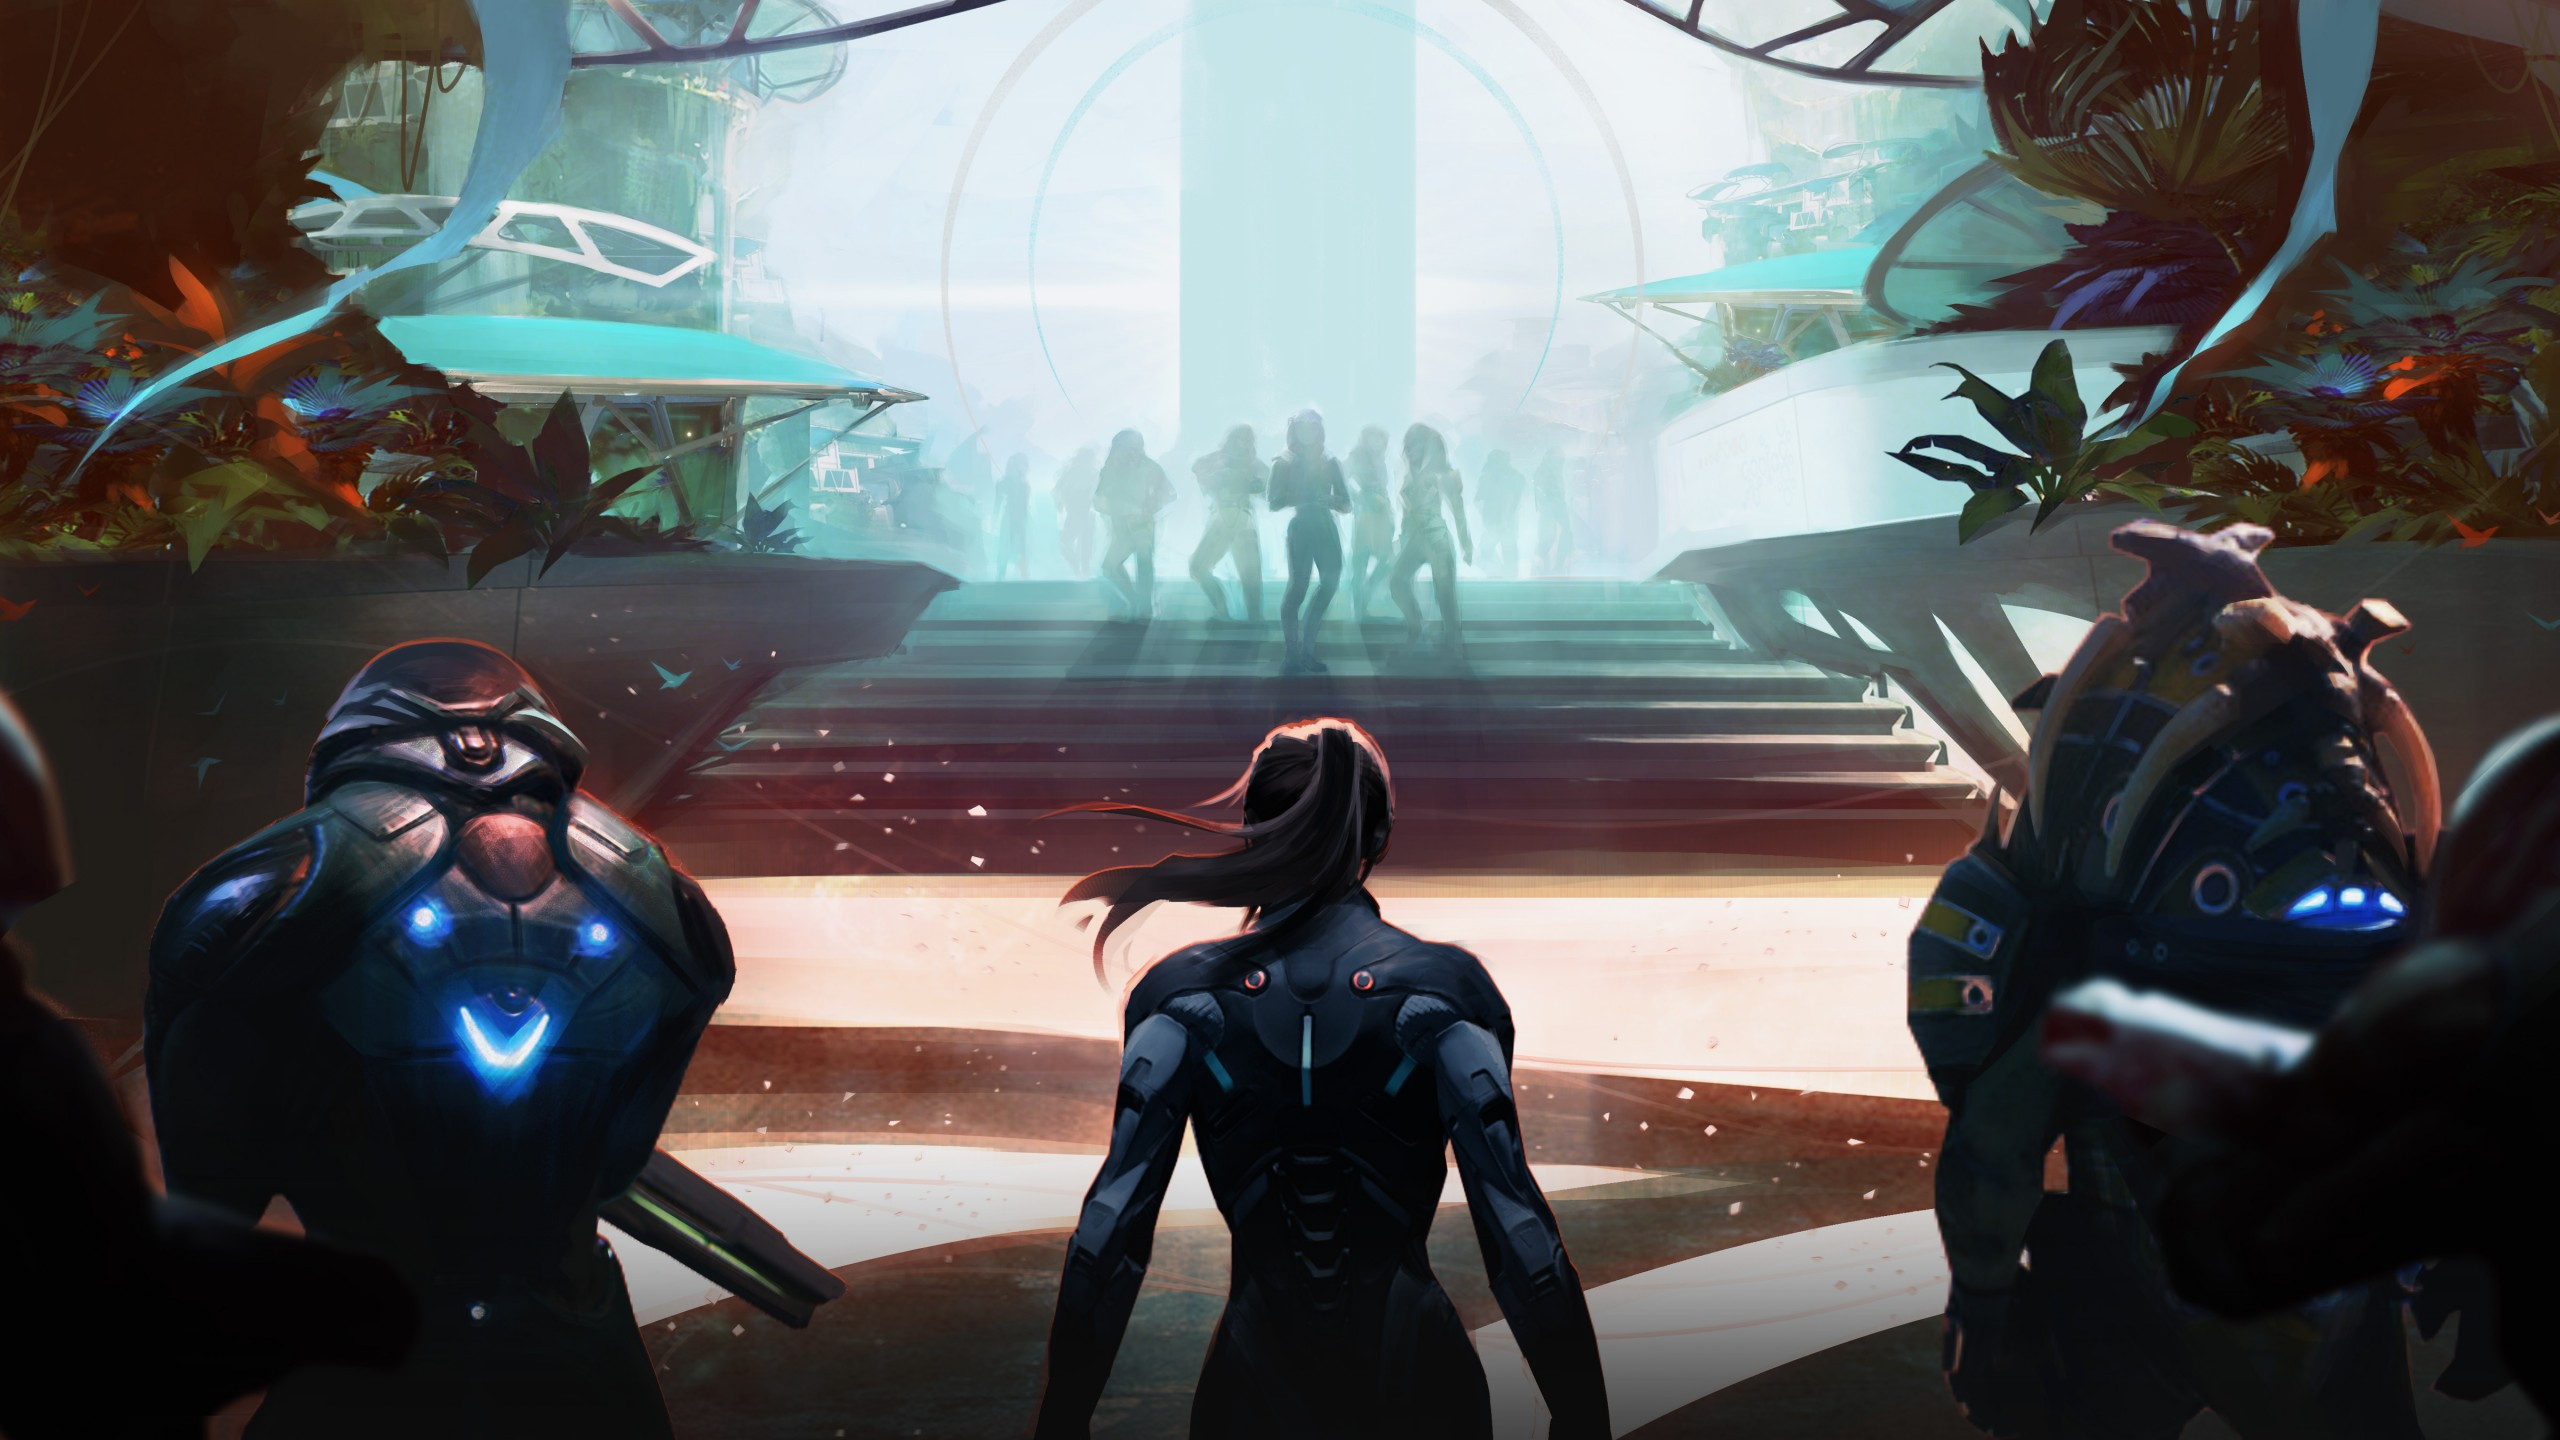 3d Effect Ipad Wallpaper Mass Effect Andromeda Artwork 4k Wallpapers Hd